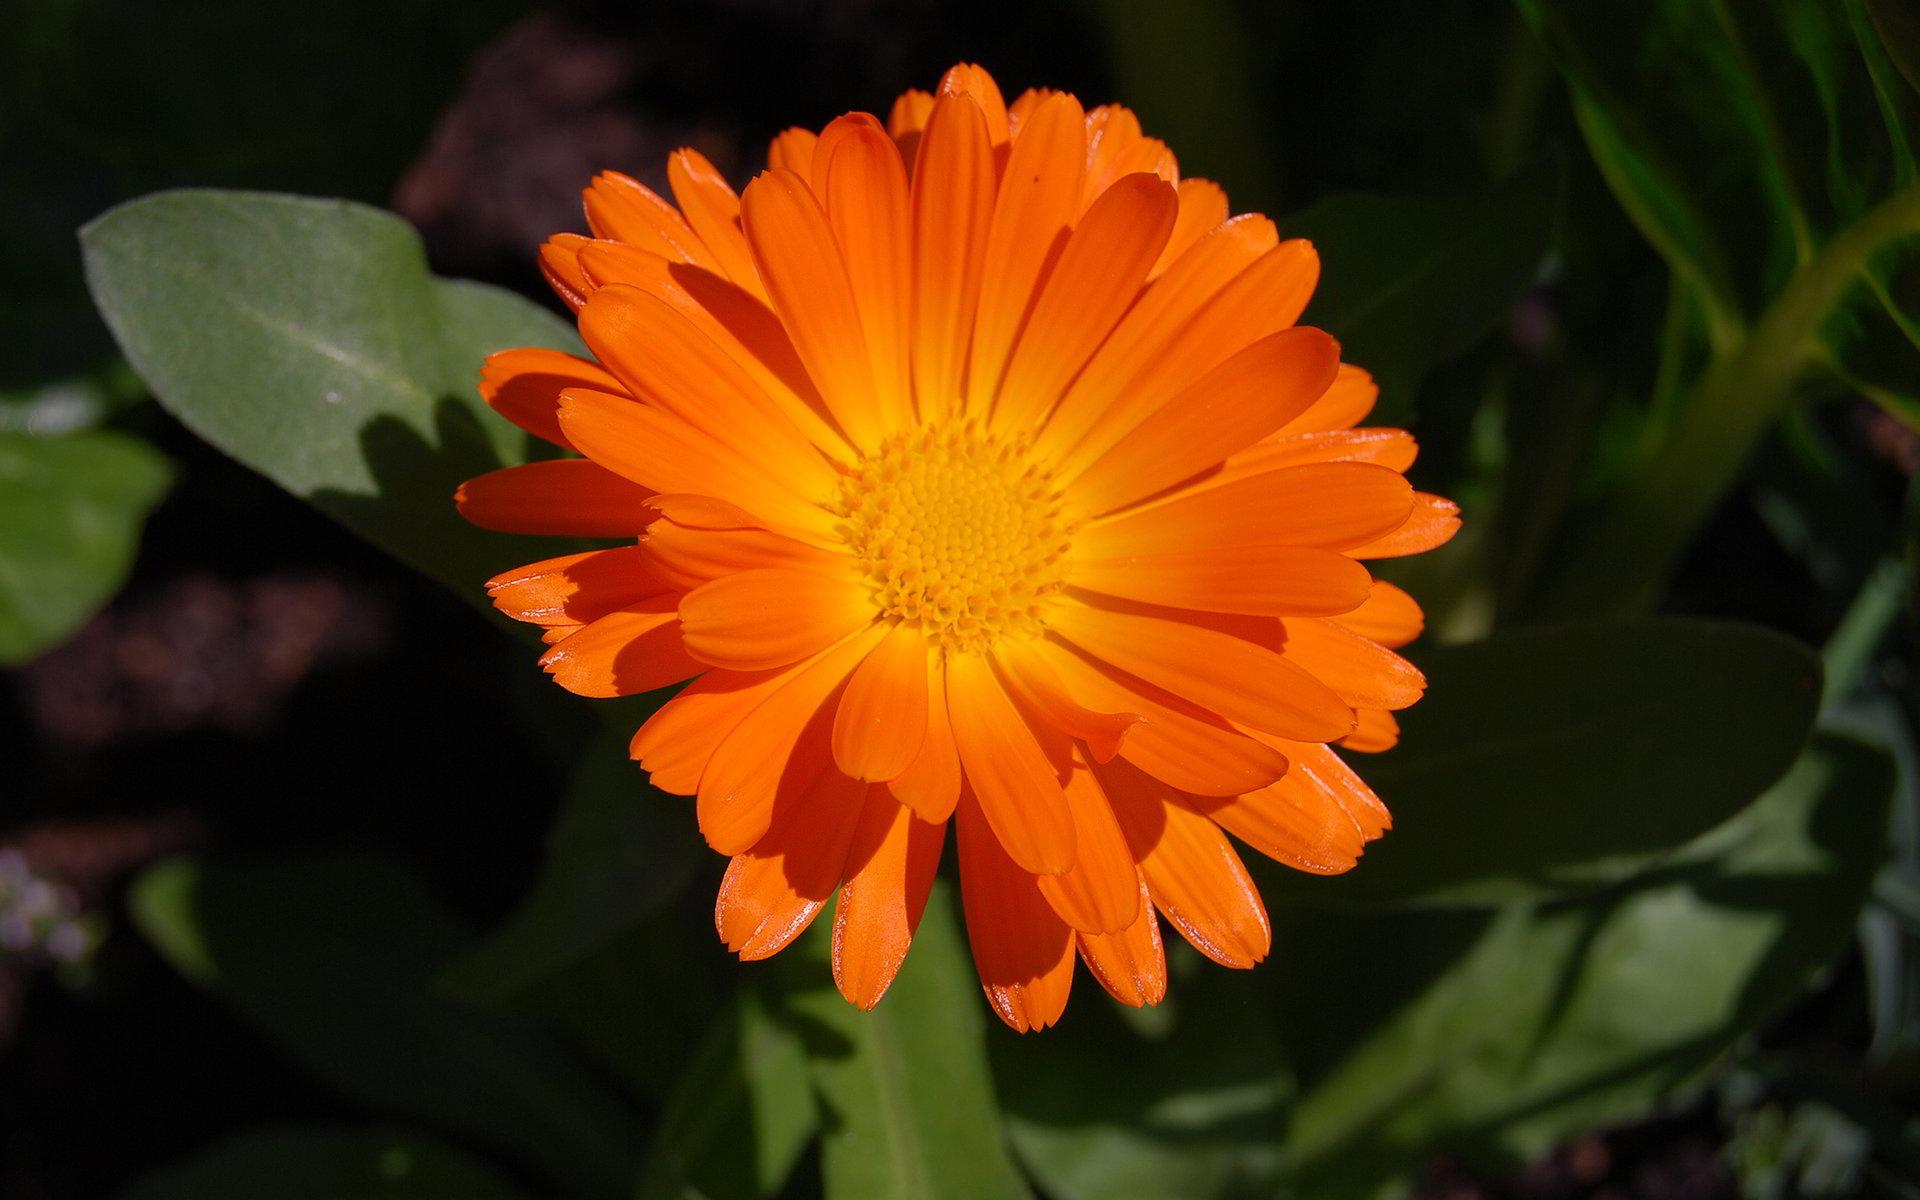 hinh anh hoa cuc dep 36